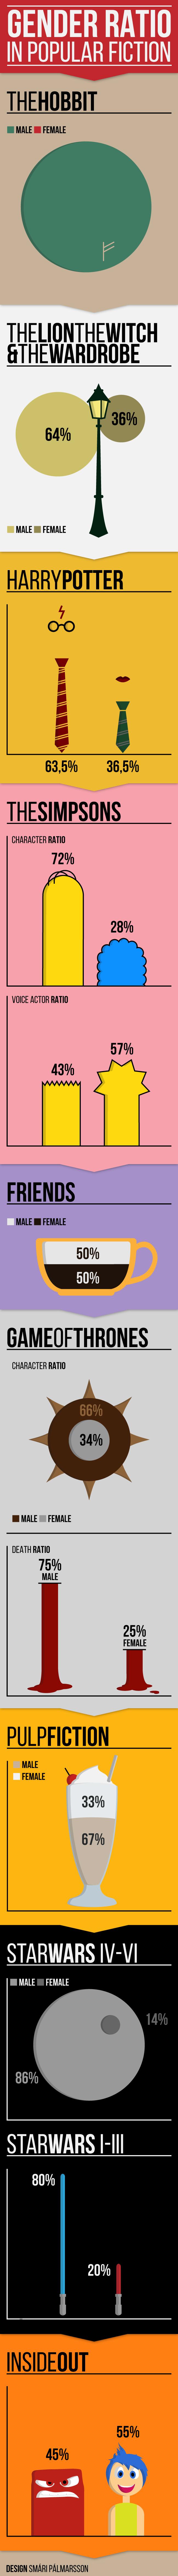 Gender ratio in popular fiction infographic